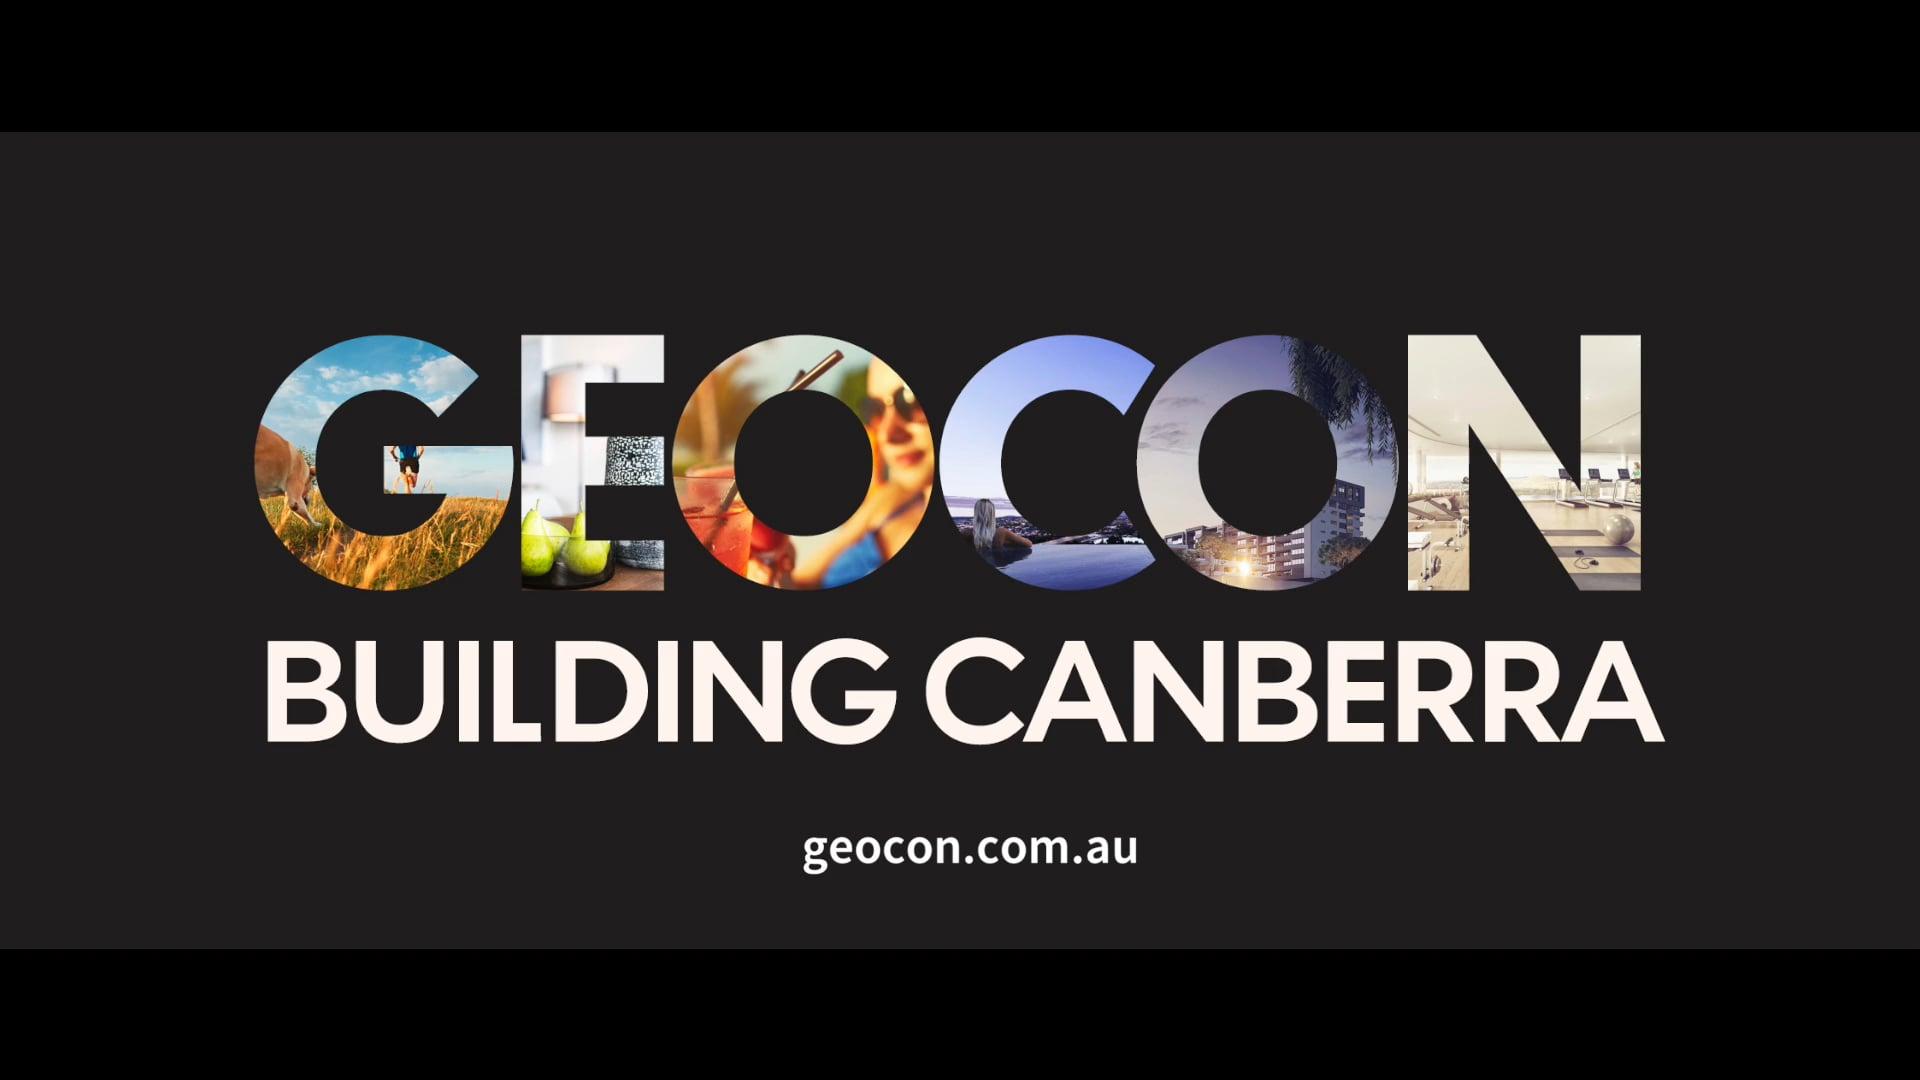 Geocon Cinema